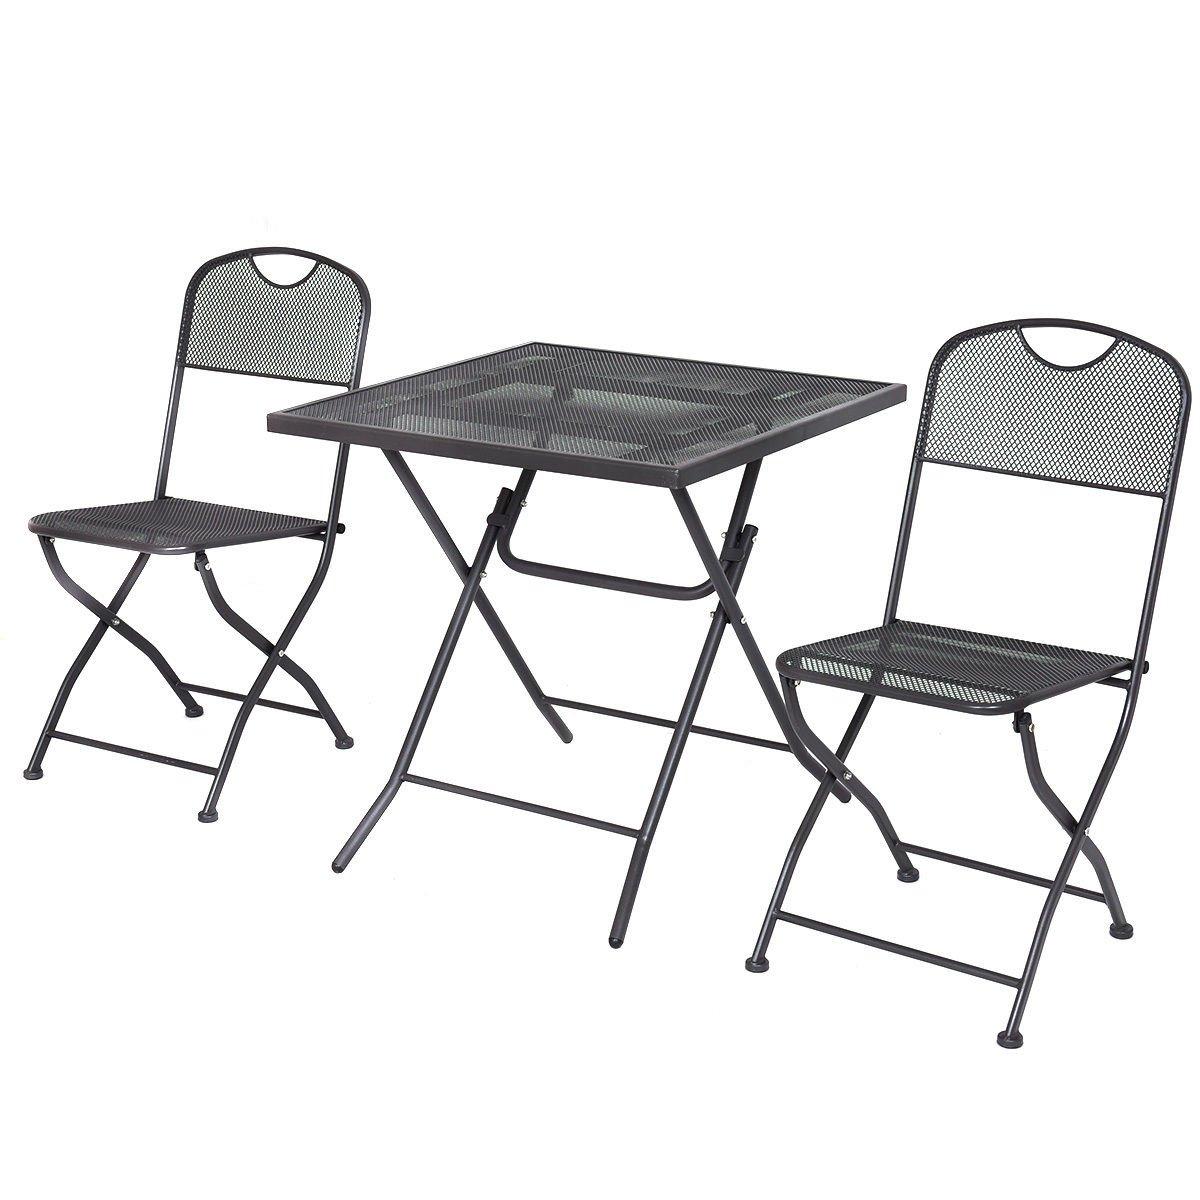 Giantex 3 PCS Outdoor Patio Bistro Furniture Set Steel Mesh Frame Bistro Square Table (Black)